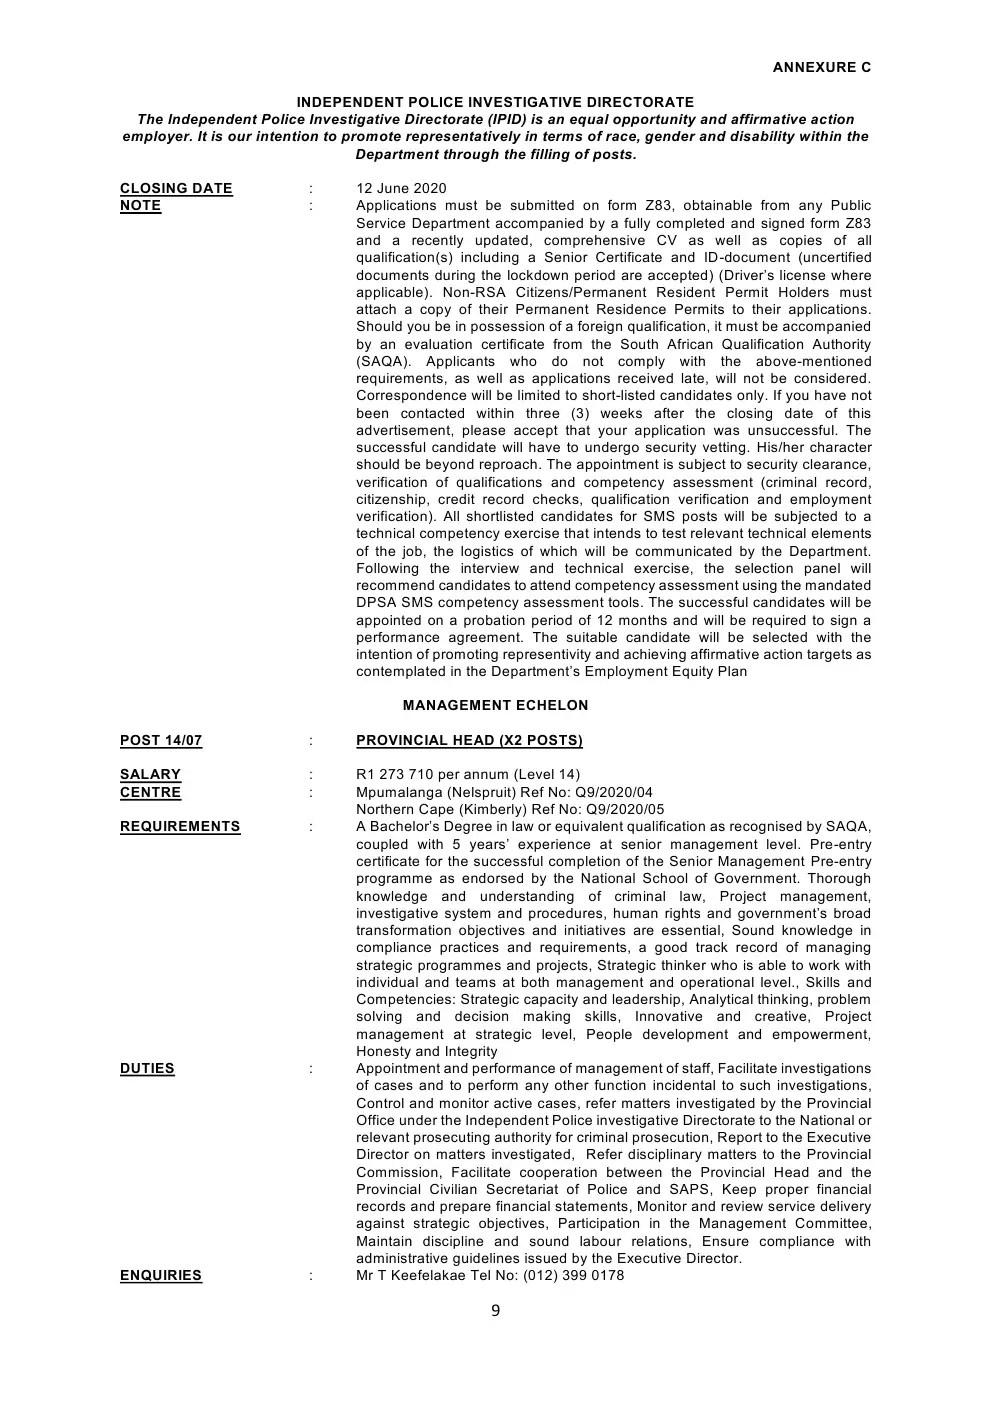 Independent Police Investigative Directorate Circular 14